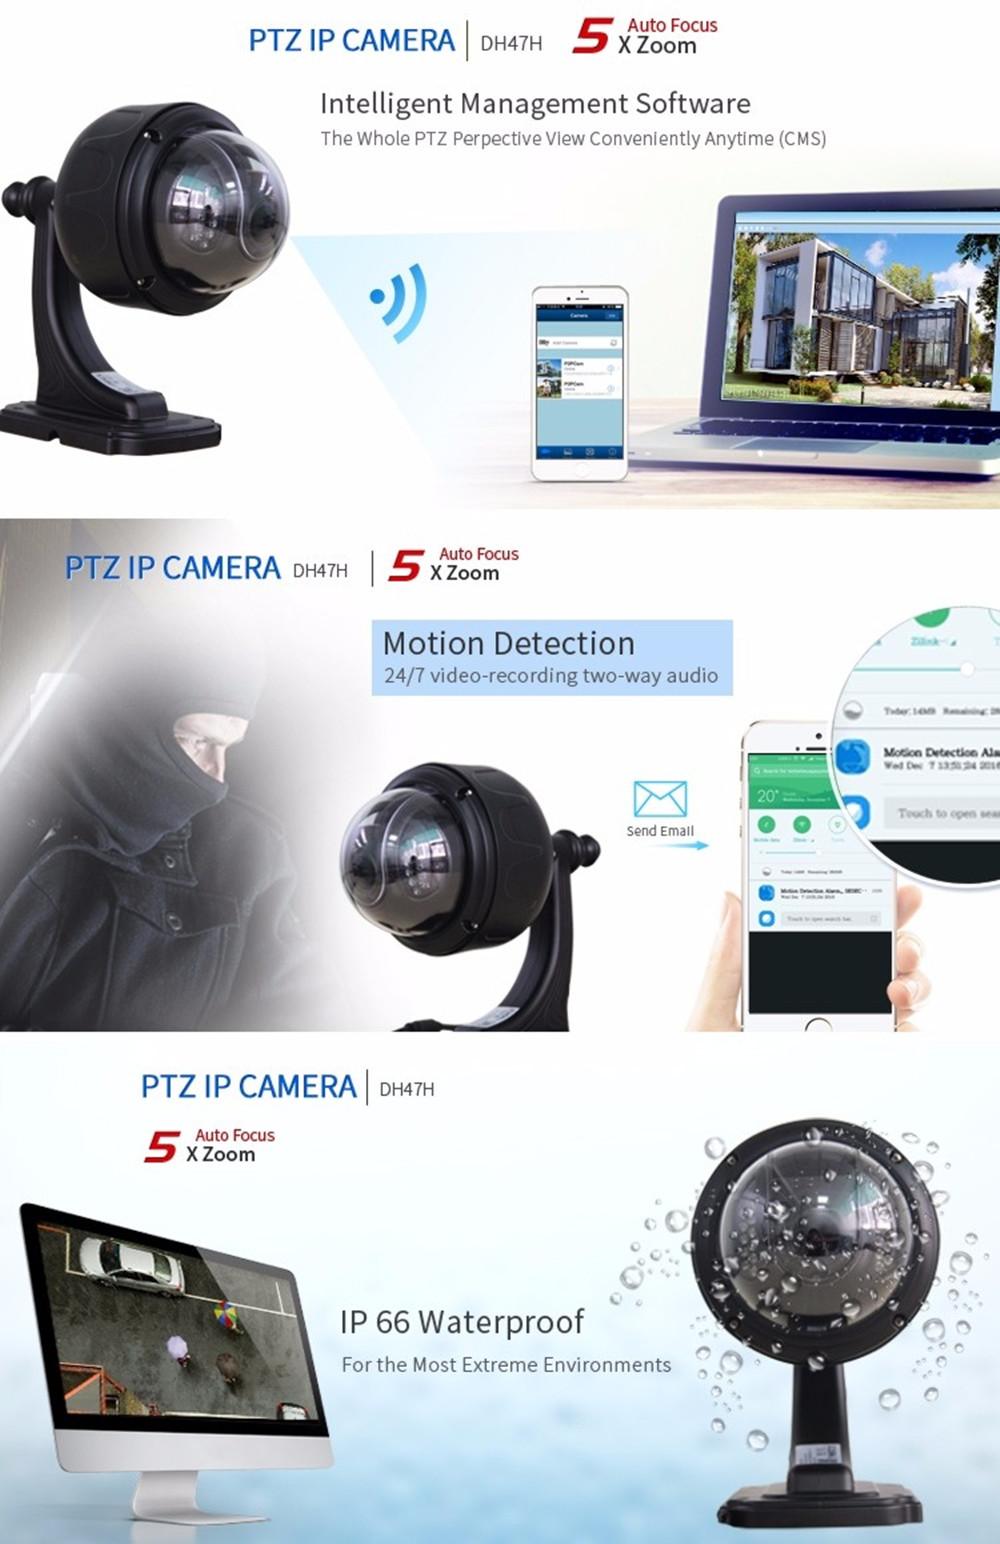 ZILNK 960P HD PTZ Speed Dome Camera DH47H Black details (1)